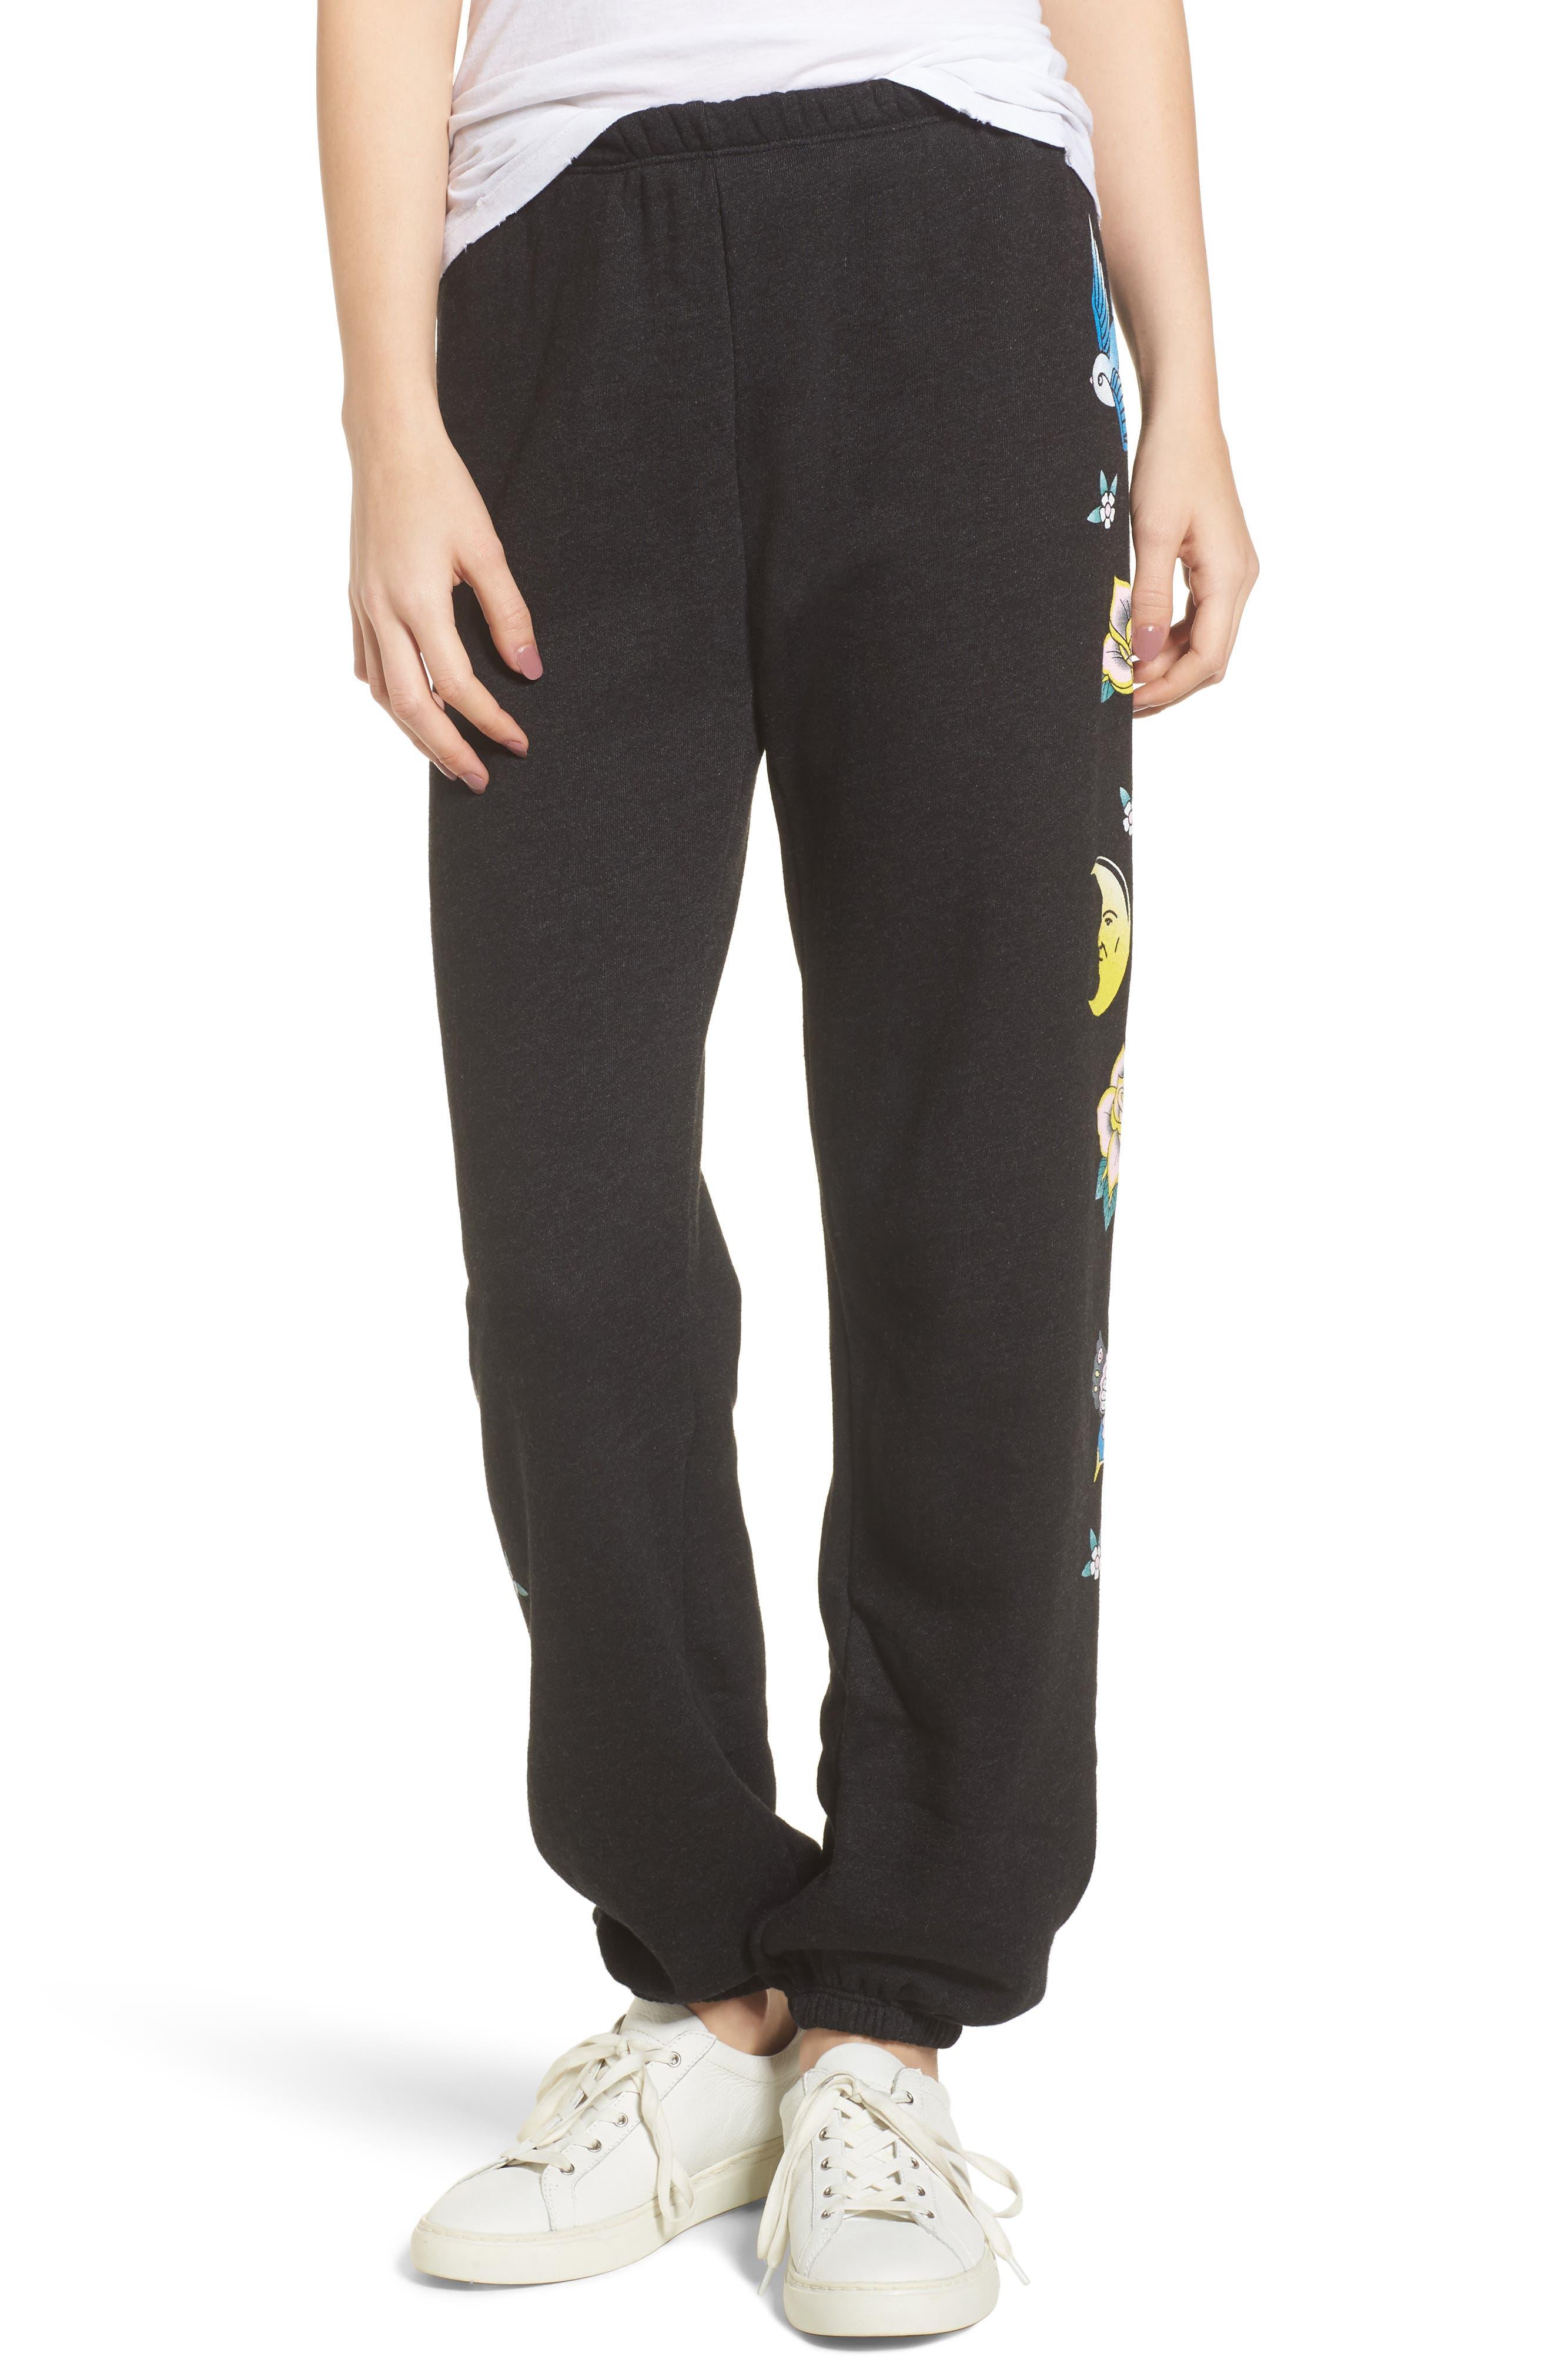 Flash Sweatpants,                             Main thumbnail 1, color,                             Black